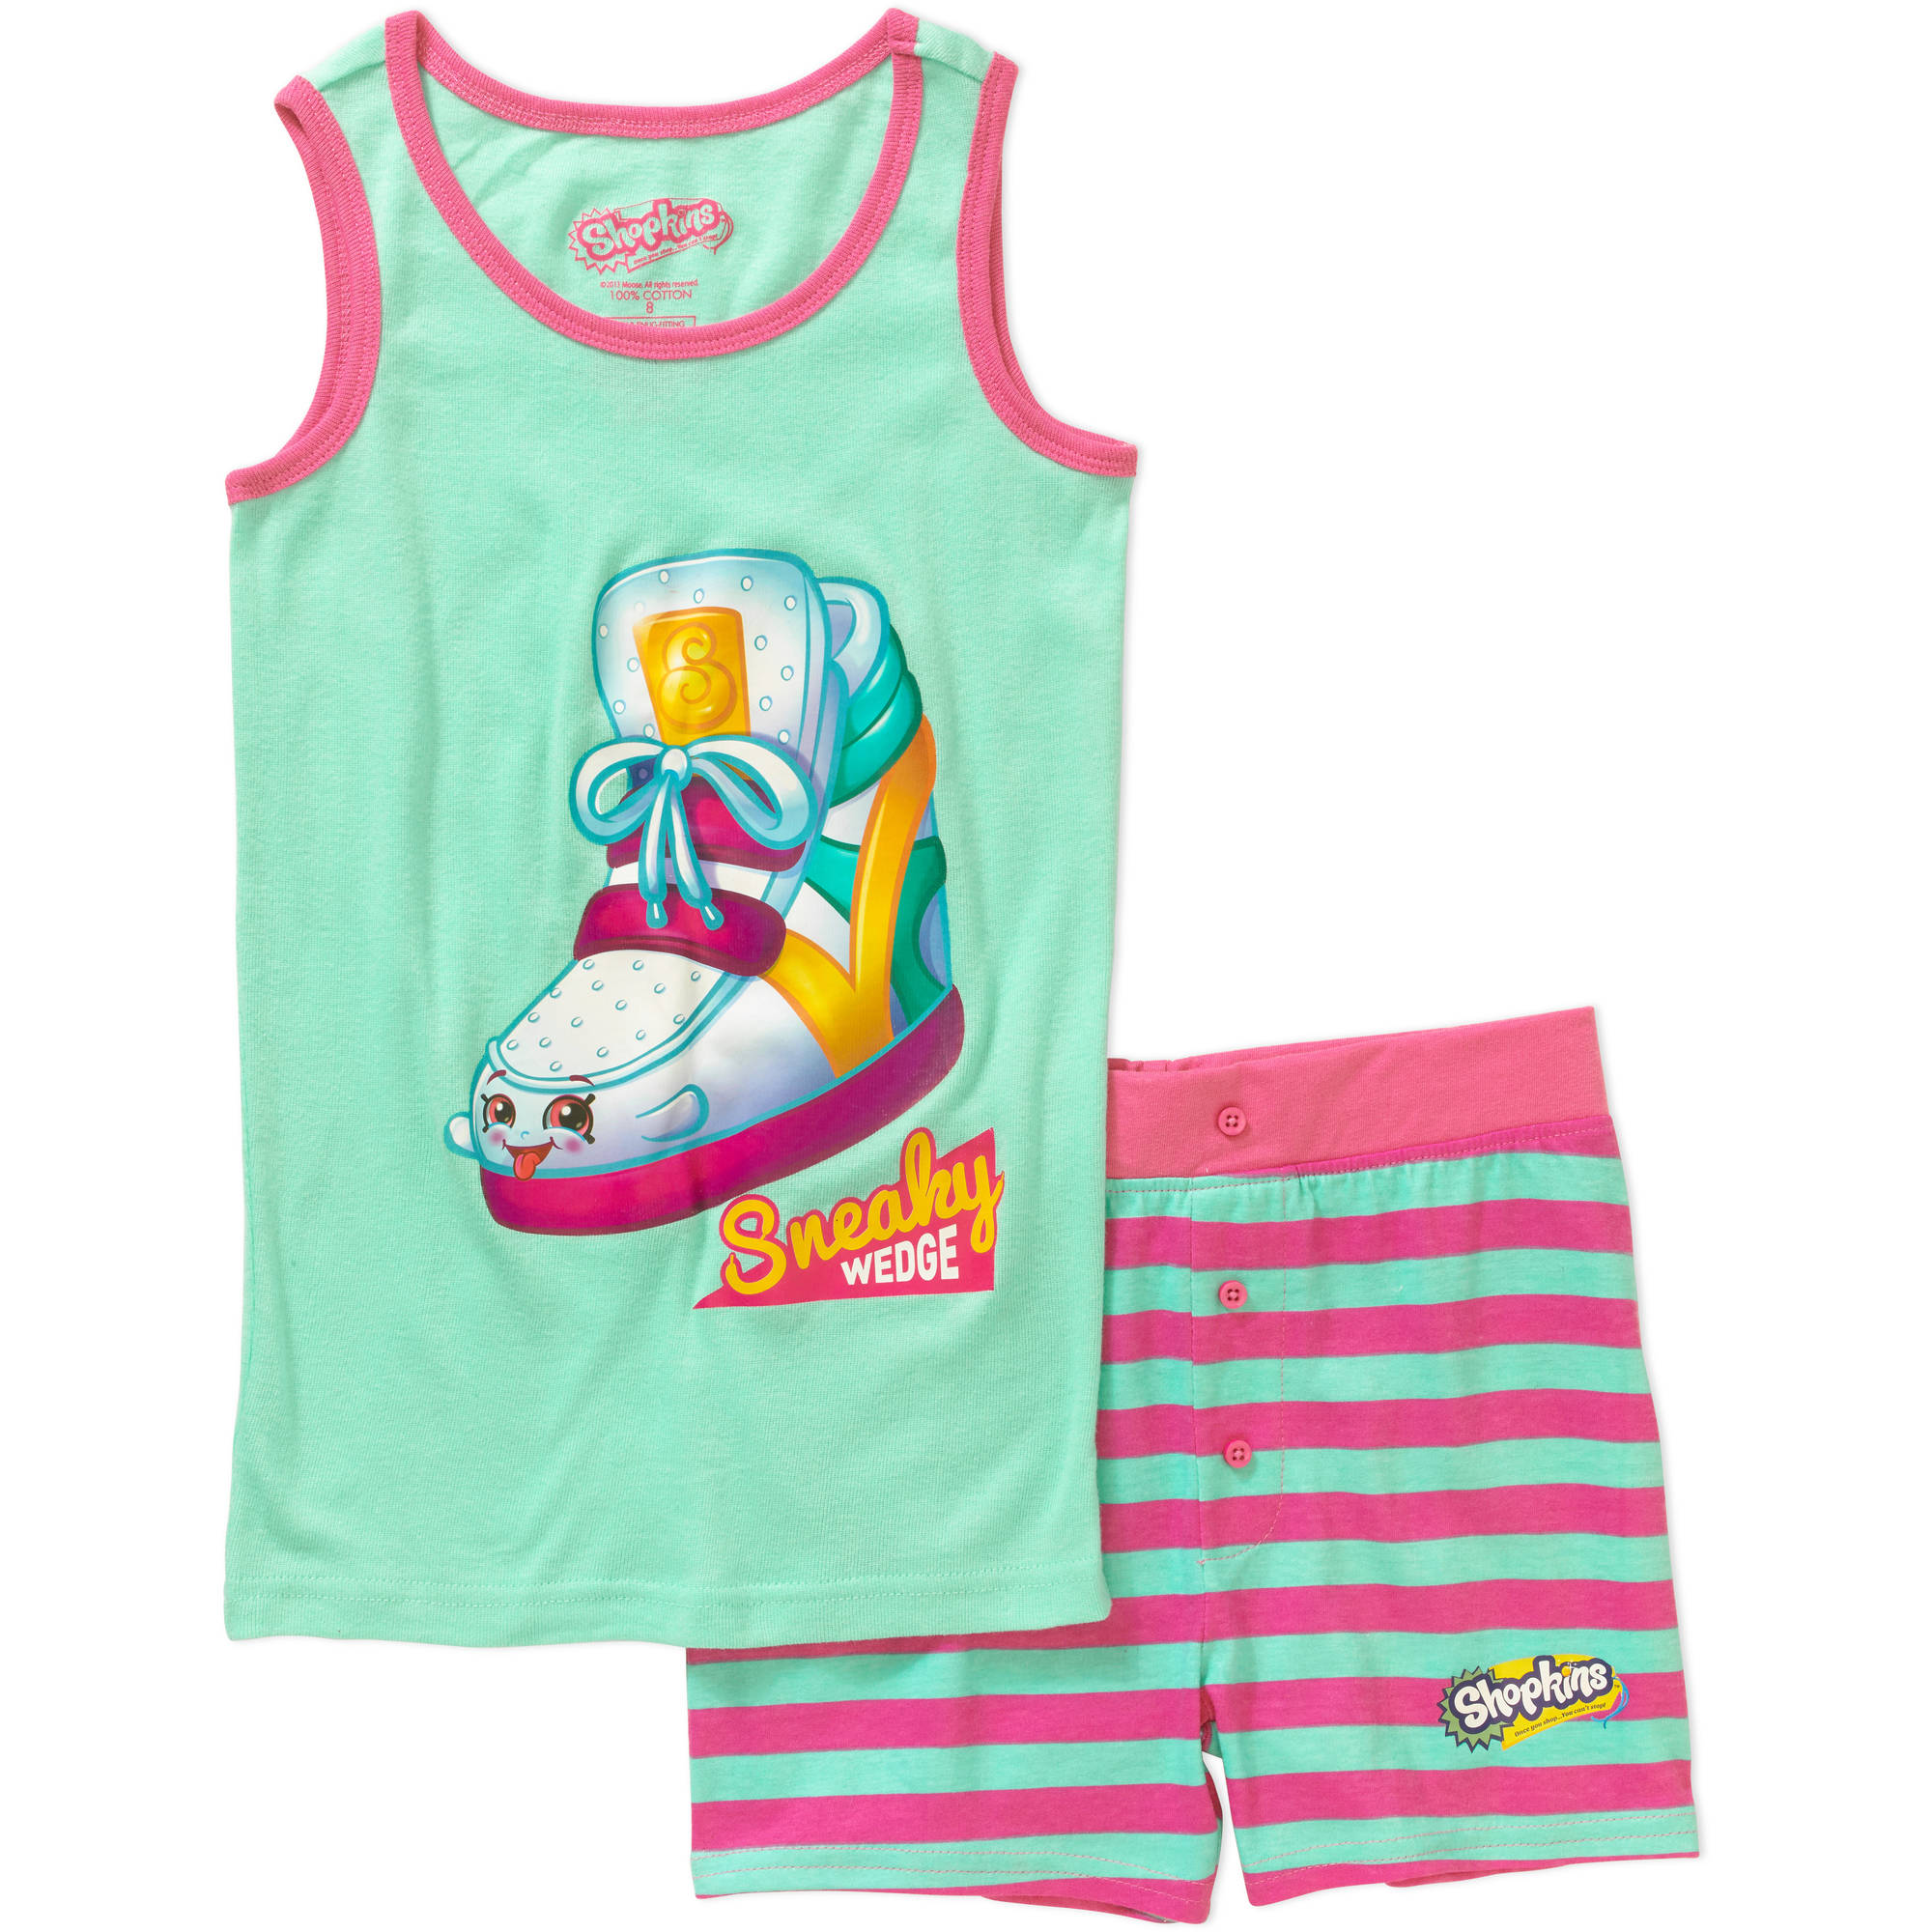 Shopkins Girls' Sneaky Wedge Tank Sleepwear Set